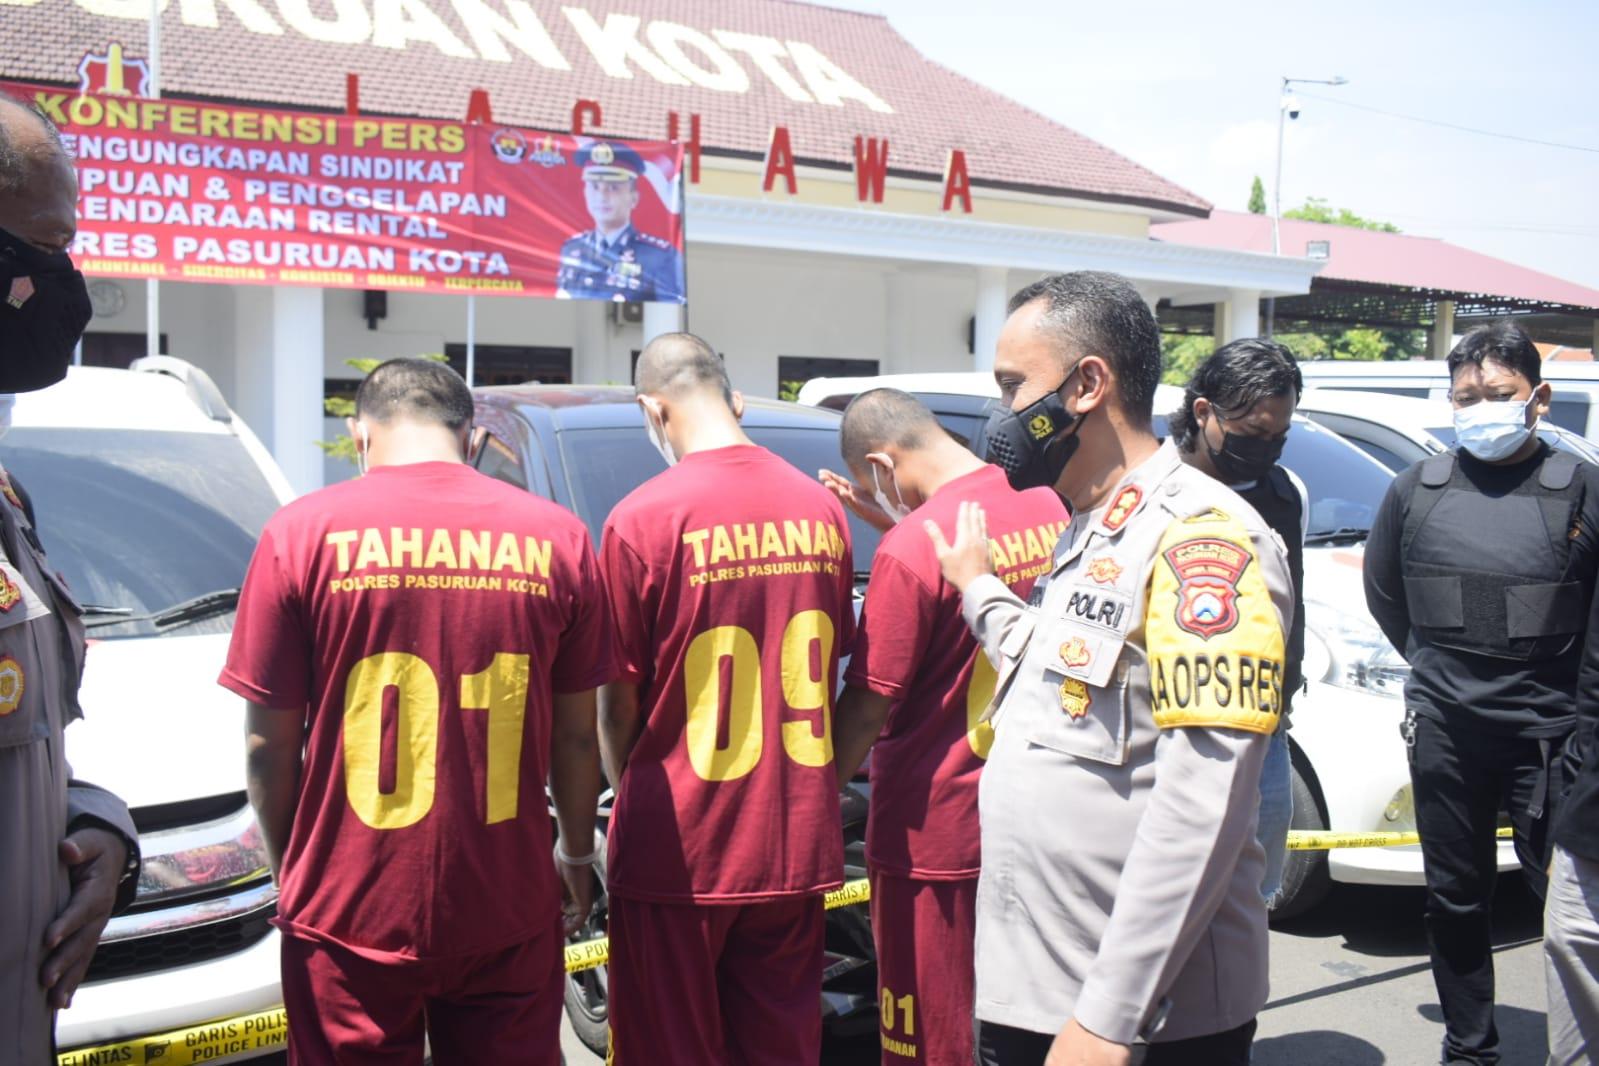 Pelaku Sindikat Penipuan dan Pengelapan Kendaraan Rental di Bekuk | Memo Surabaya